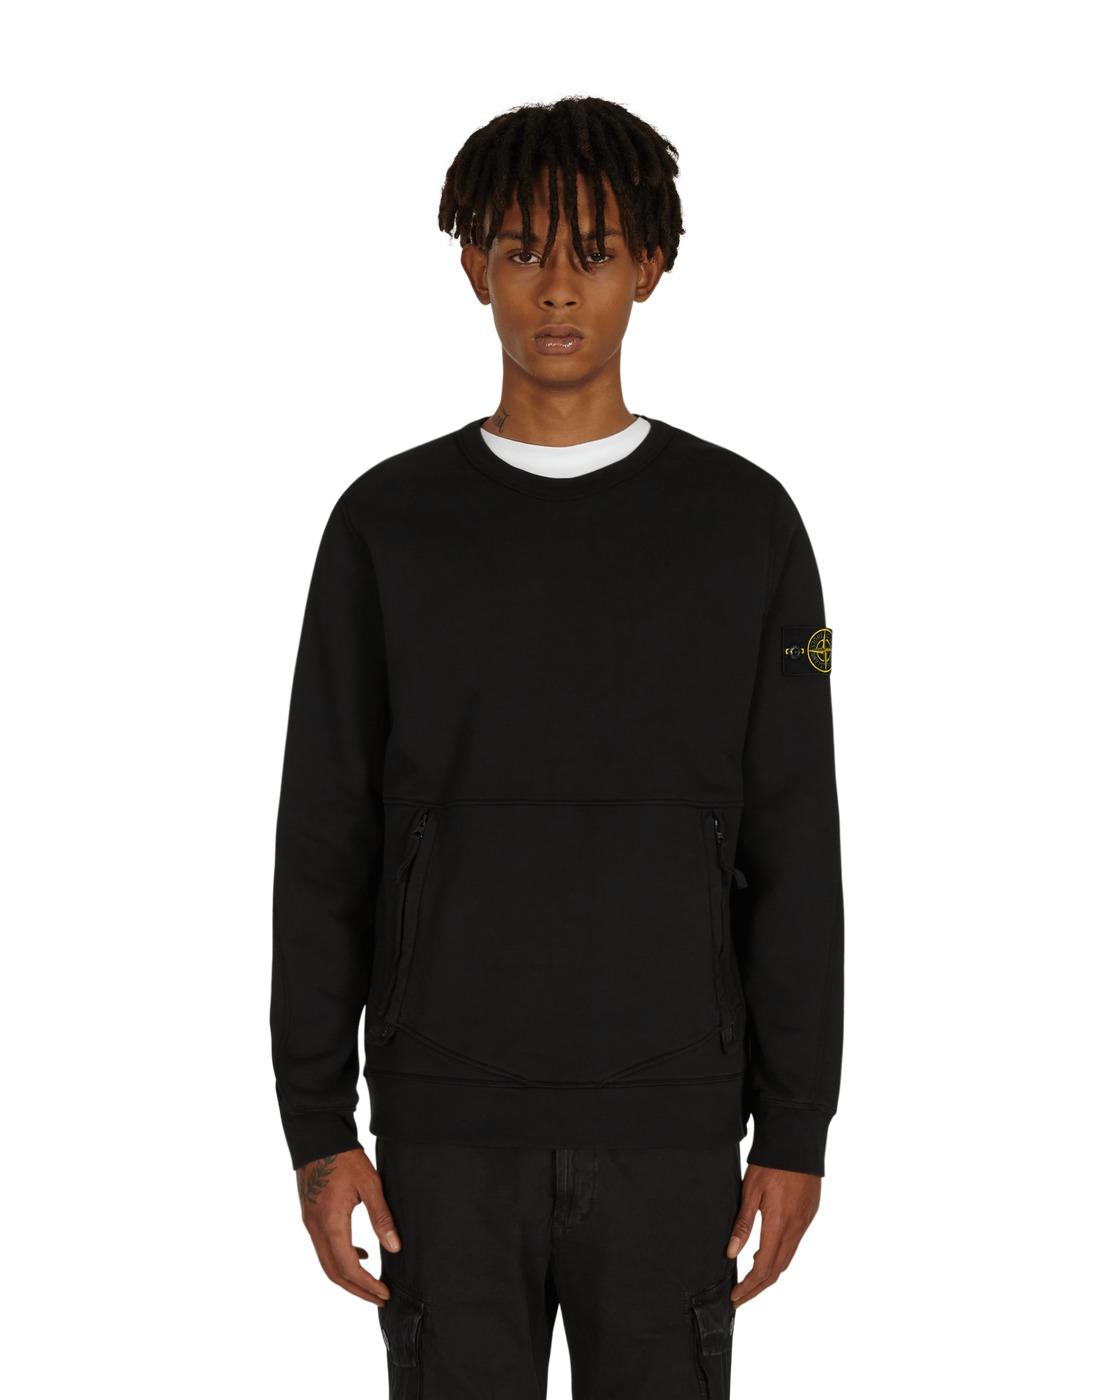 Stone Island Front Pocket Crewneck Sweatshirt Black